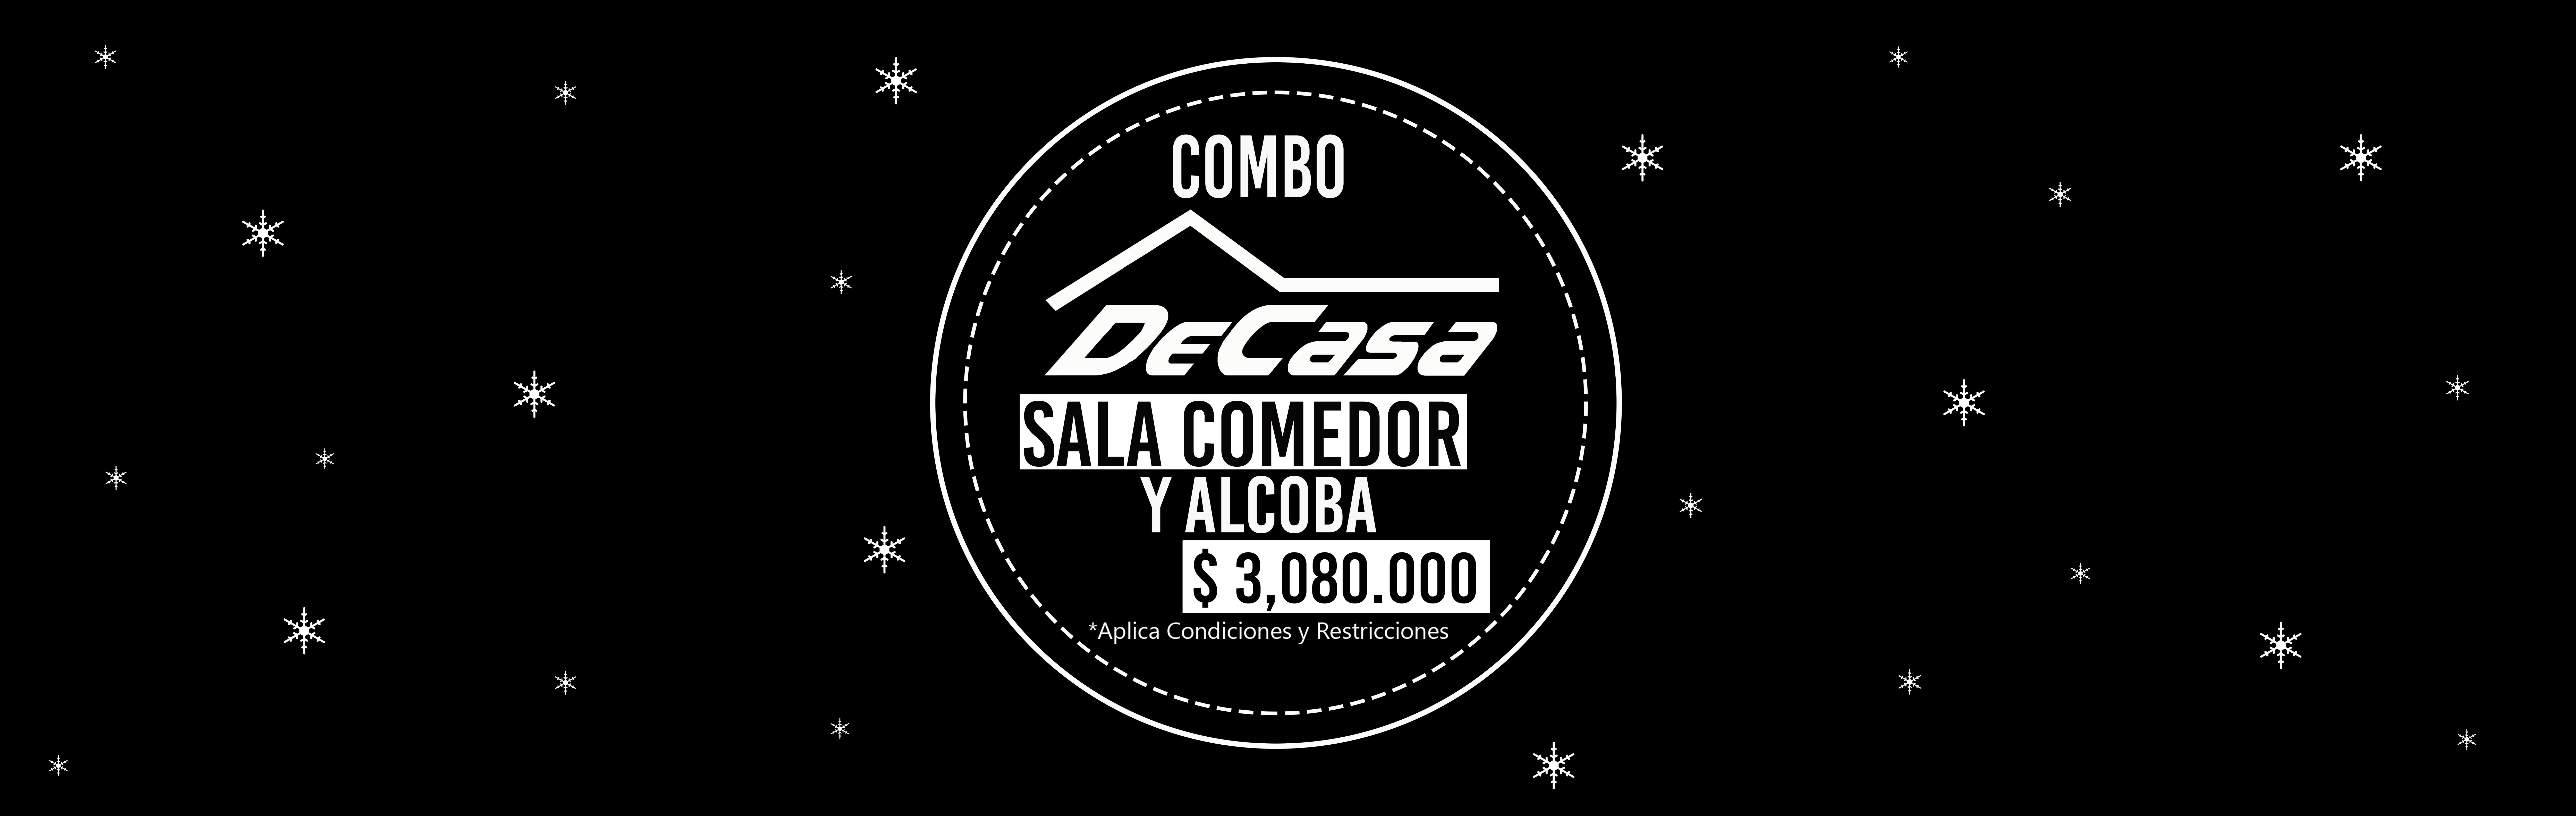 COMBO  DECASA.jpg